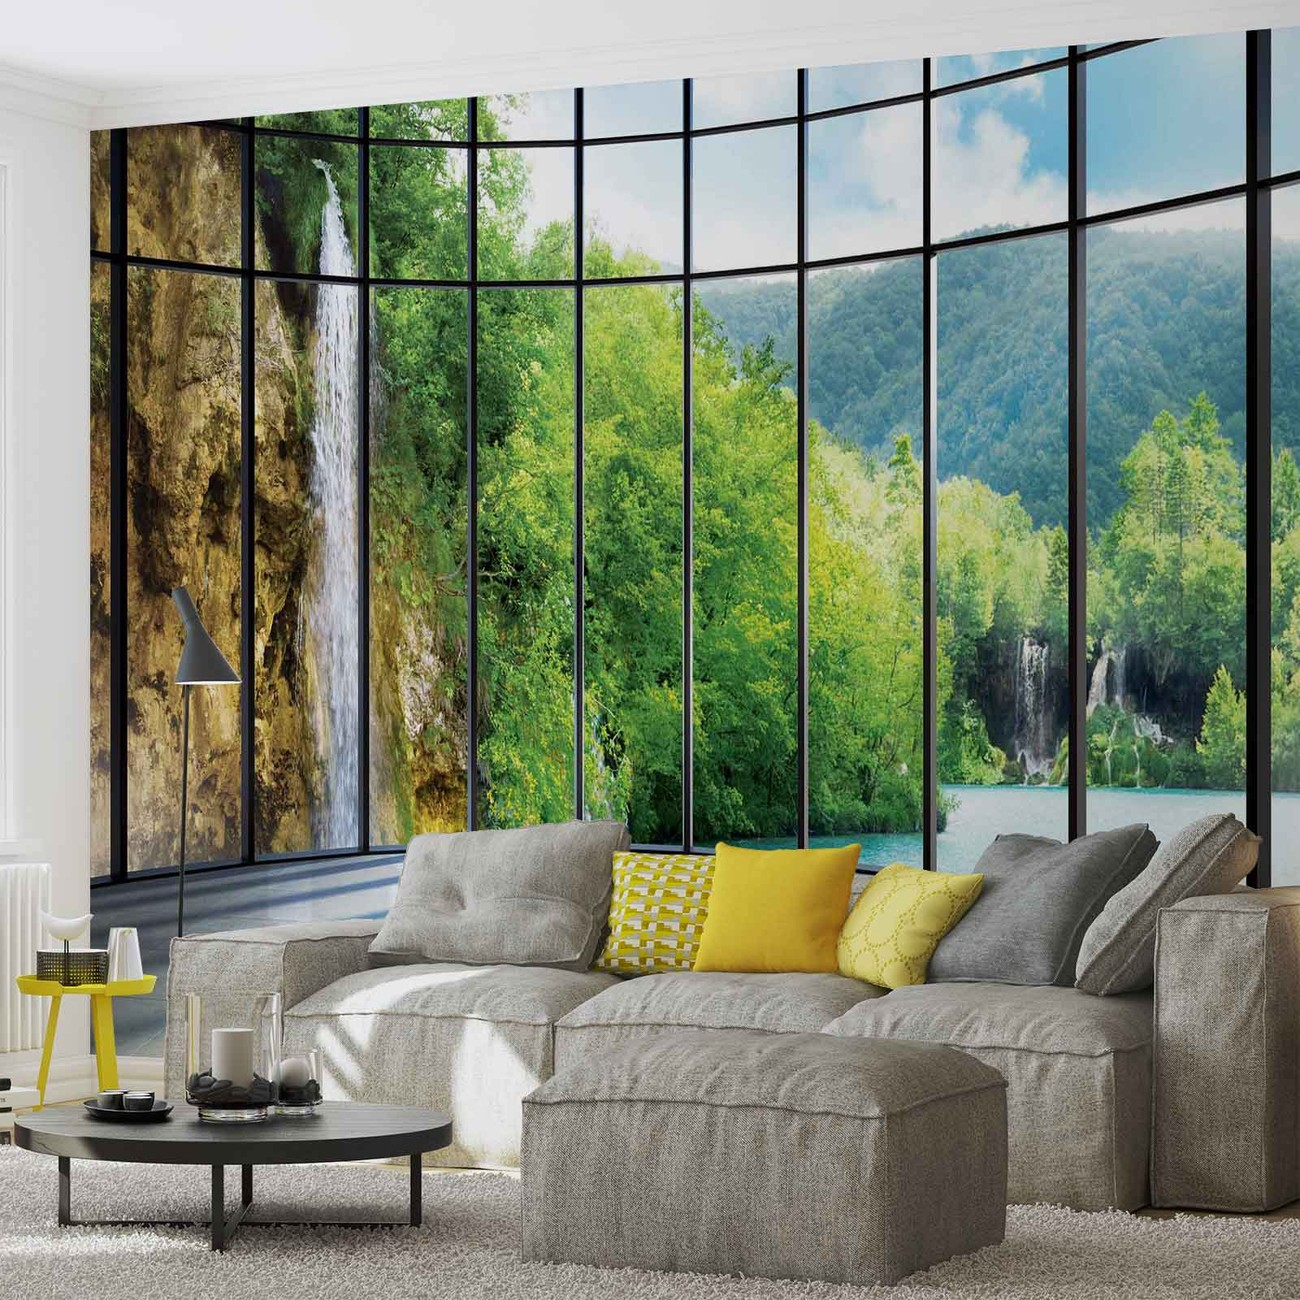 Fotomurale ver paisaje tropical papel pintado - Papel pintado paisajes ...